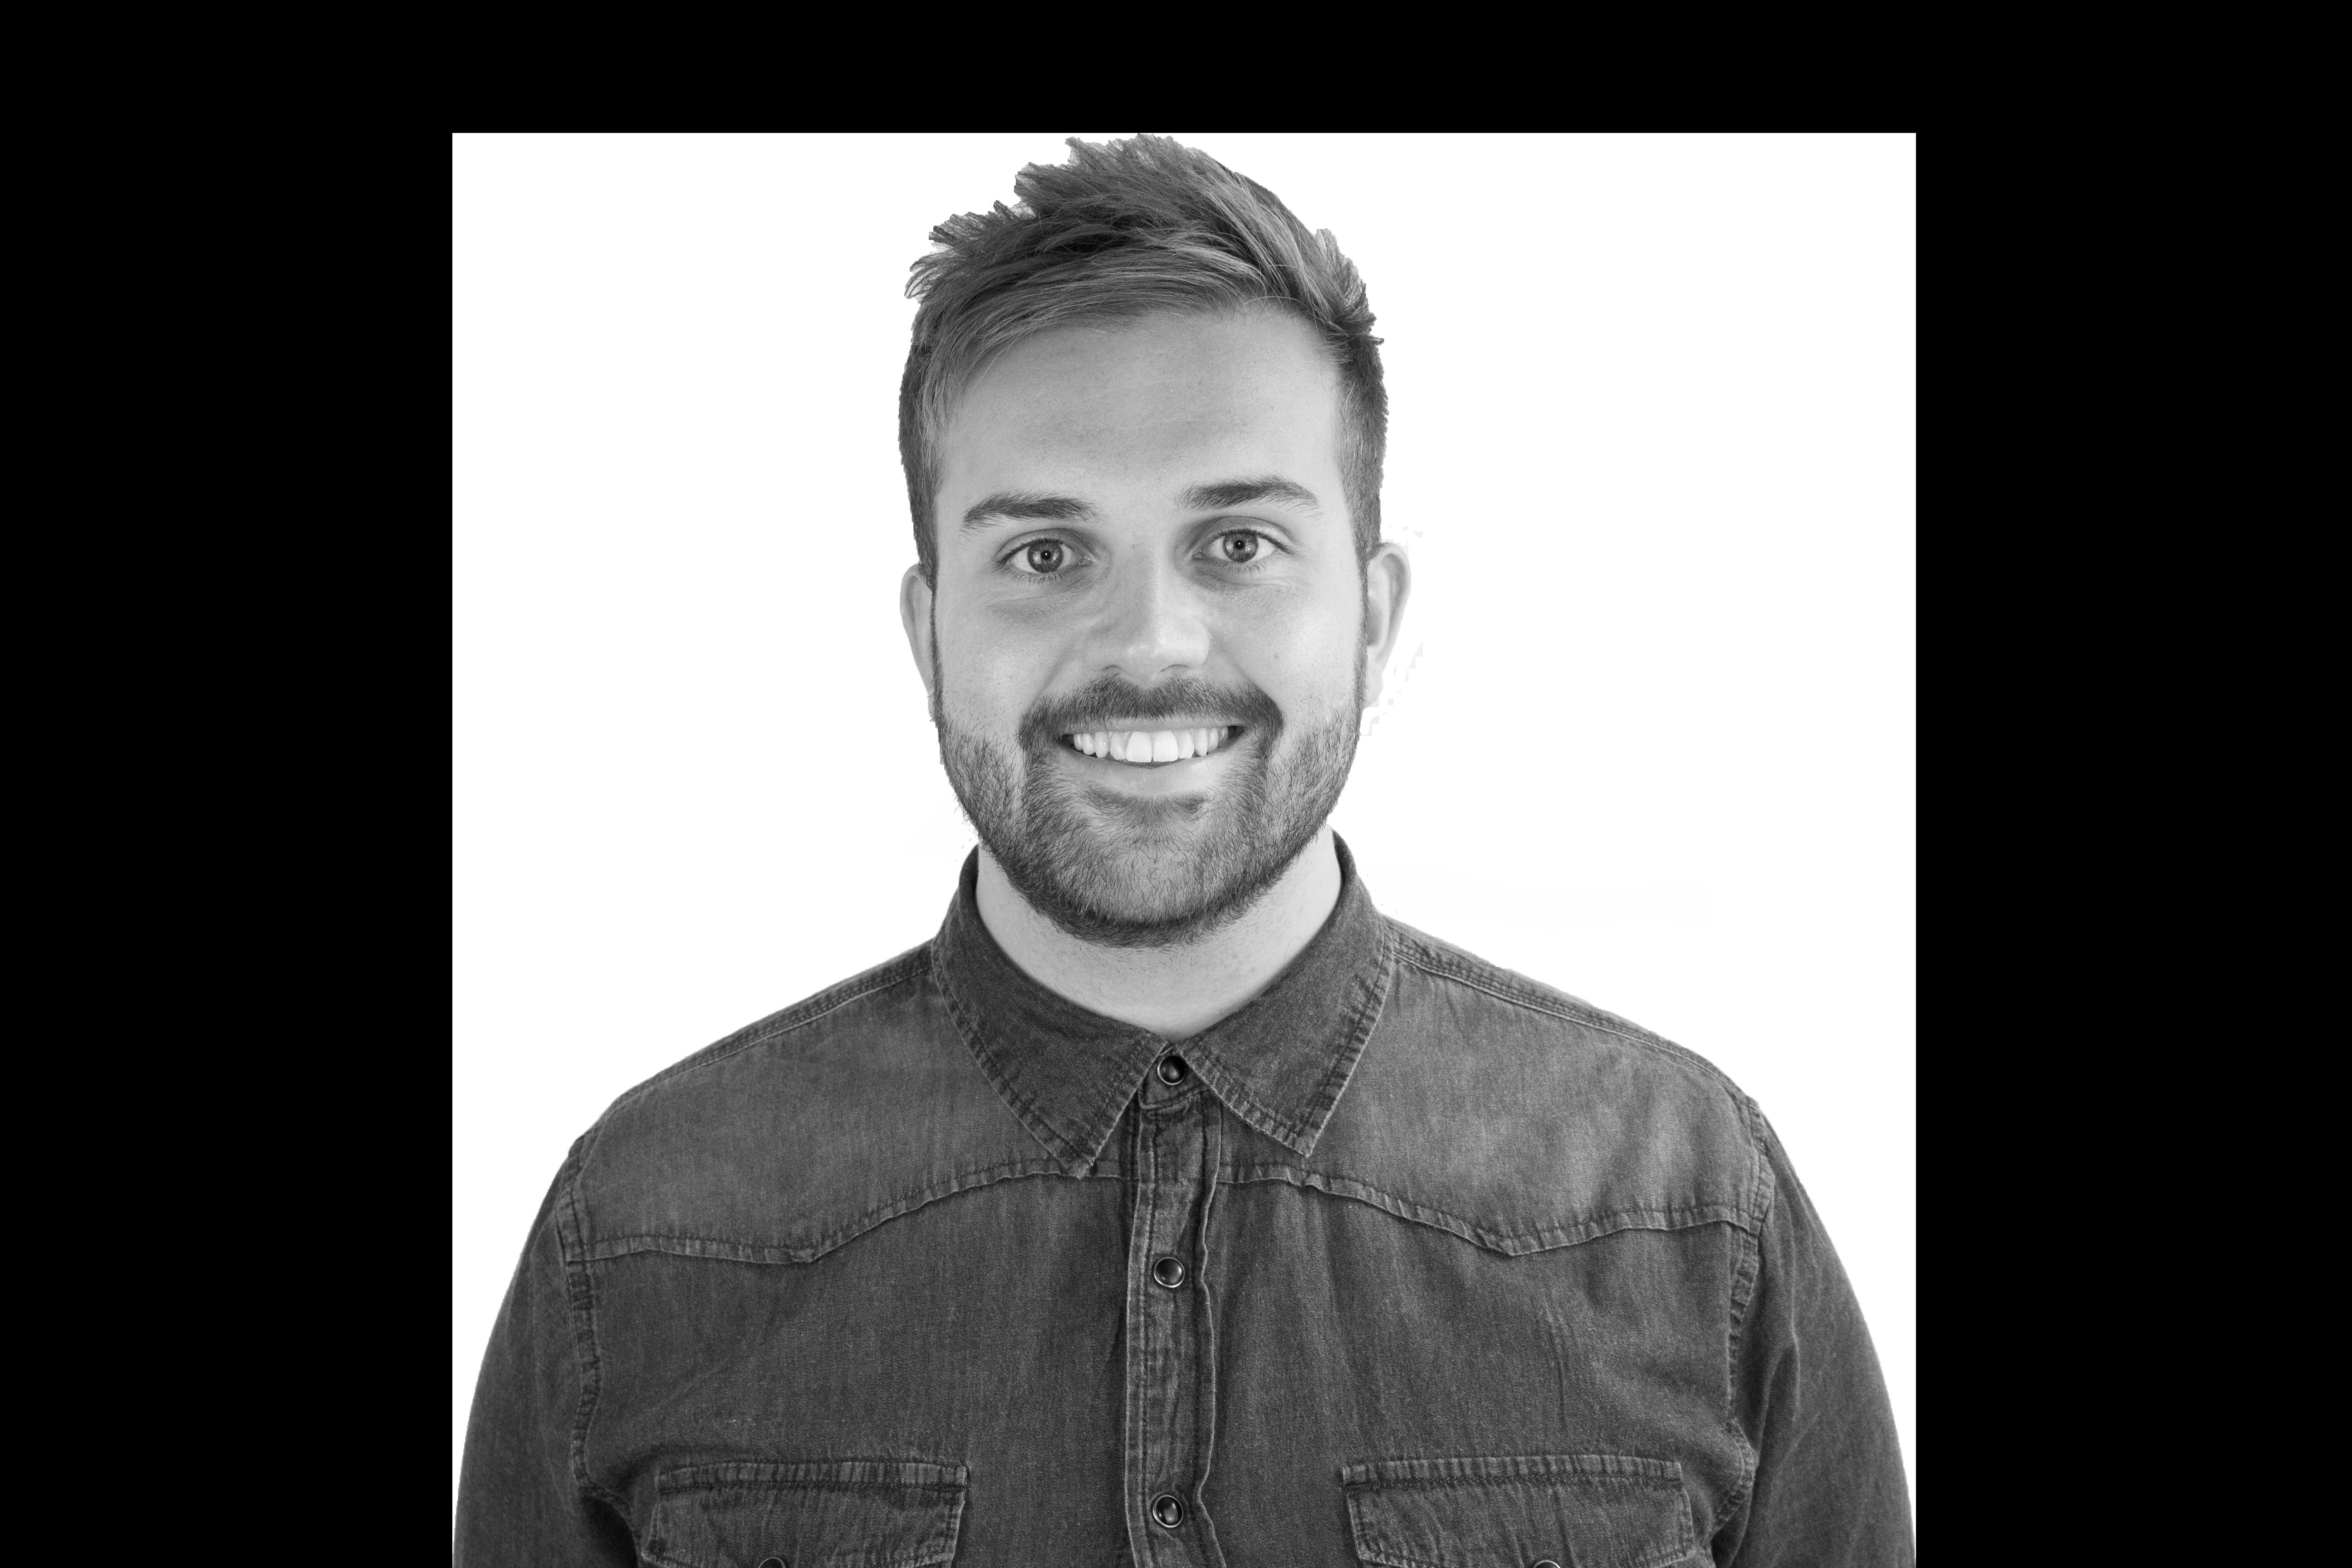 Portrait of Chris Donnelly